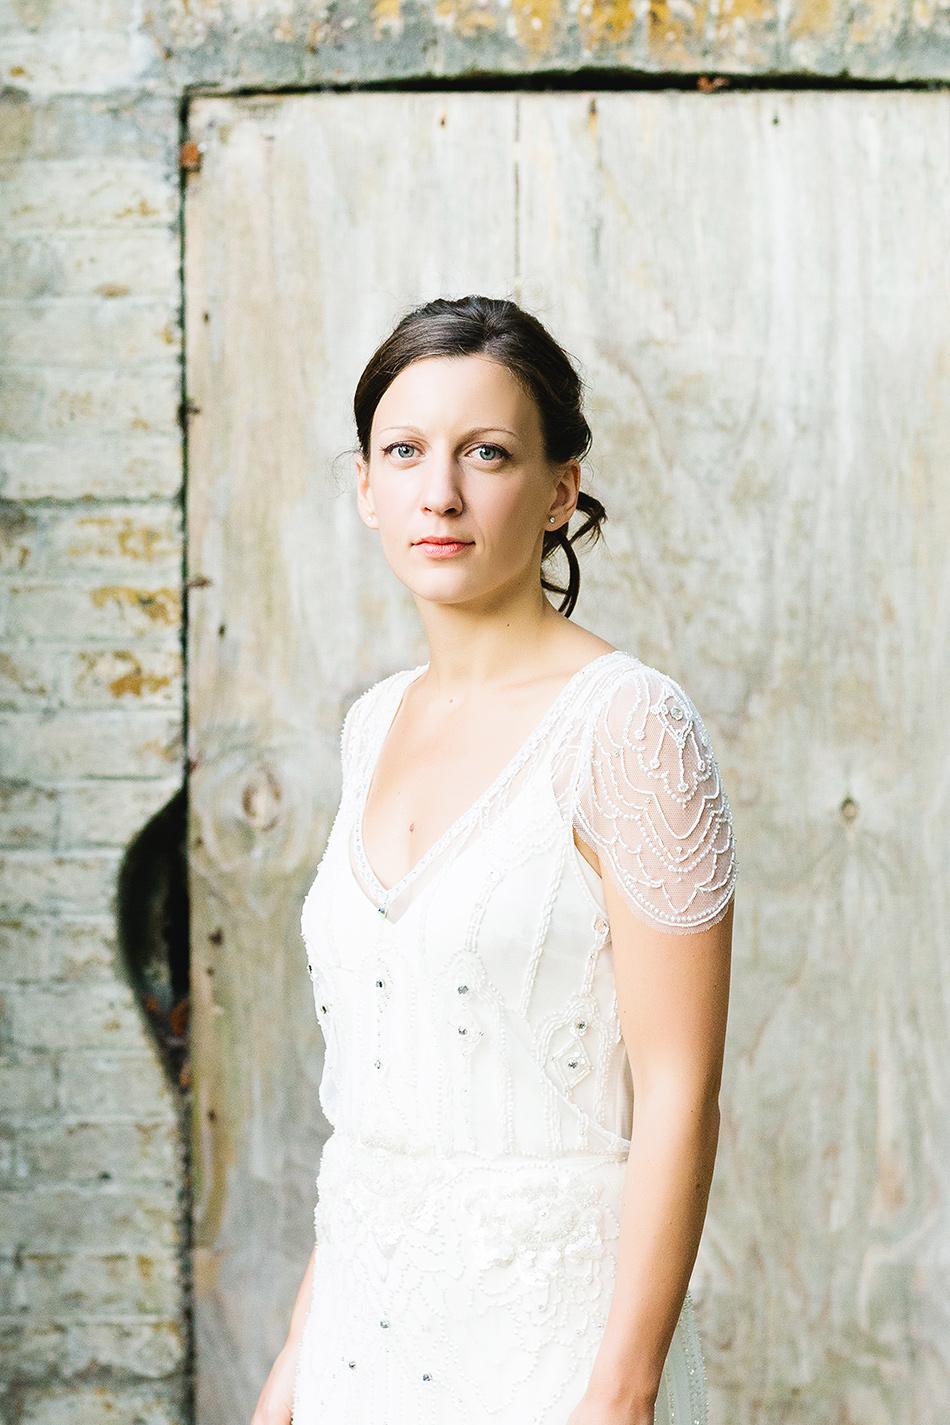 creative wedding photographer sunshine coast wedding photographer brisbane wedding jenny packham wedding dress